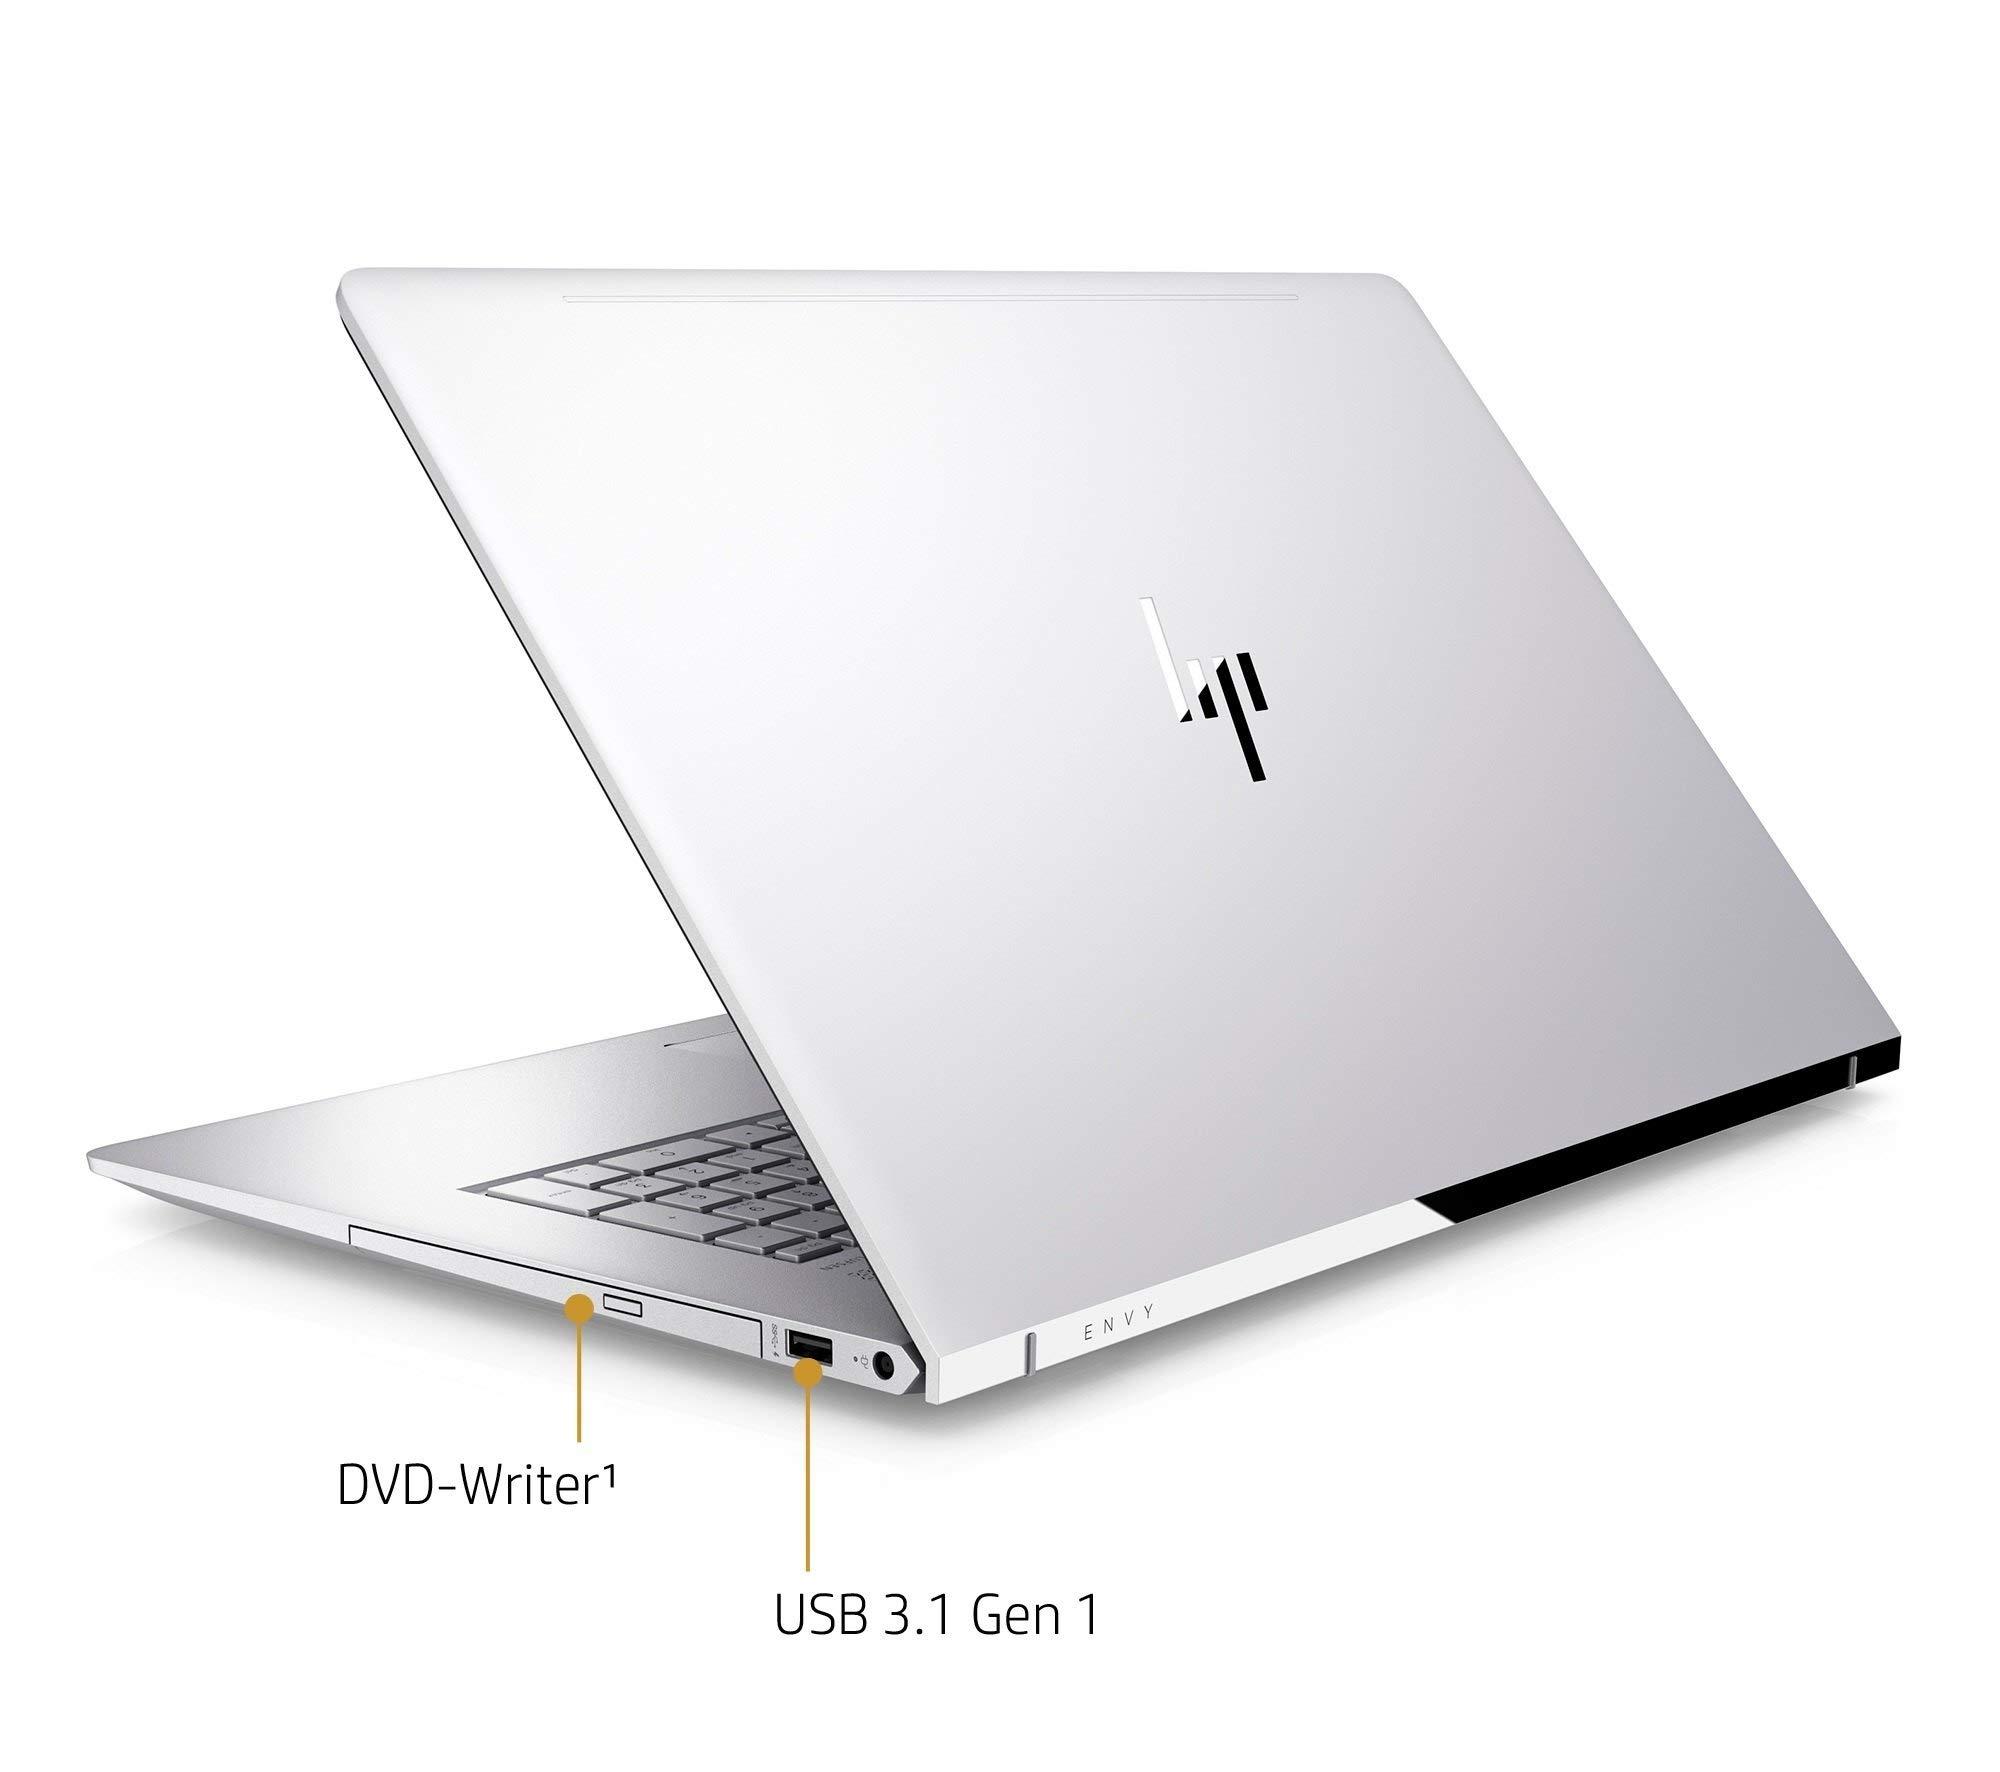 HP Envy 17~ae111dx Laptop 17.3in Edge-to-Edge IPS TouchScreen Full HD (1920x1080), 8th Gen Quad-Core i7-8550U, 16GB DDR4, 1TB HDD, NVIDIA MX150, IR Camera, Backlit, Windows 10 (Renewed )